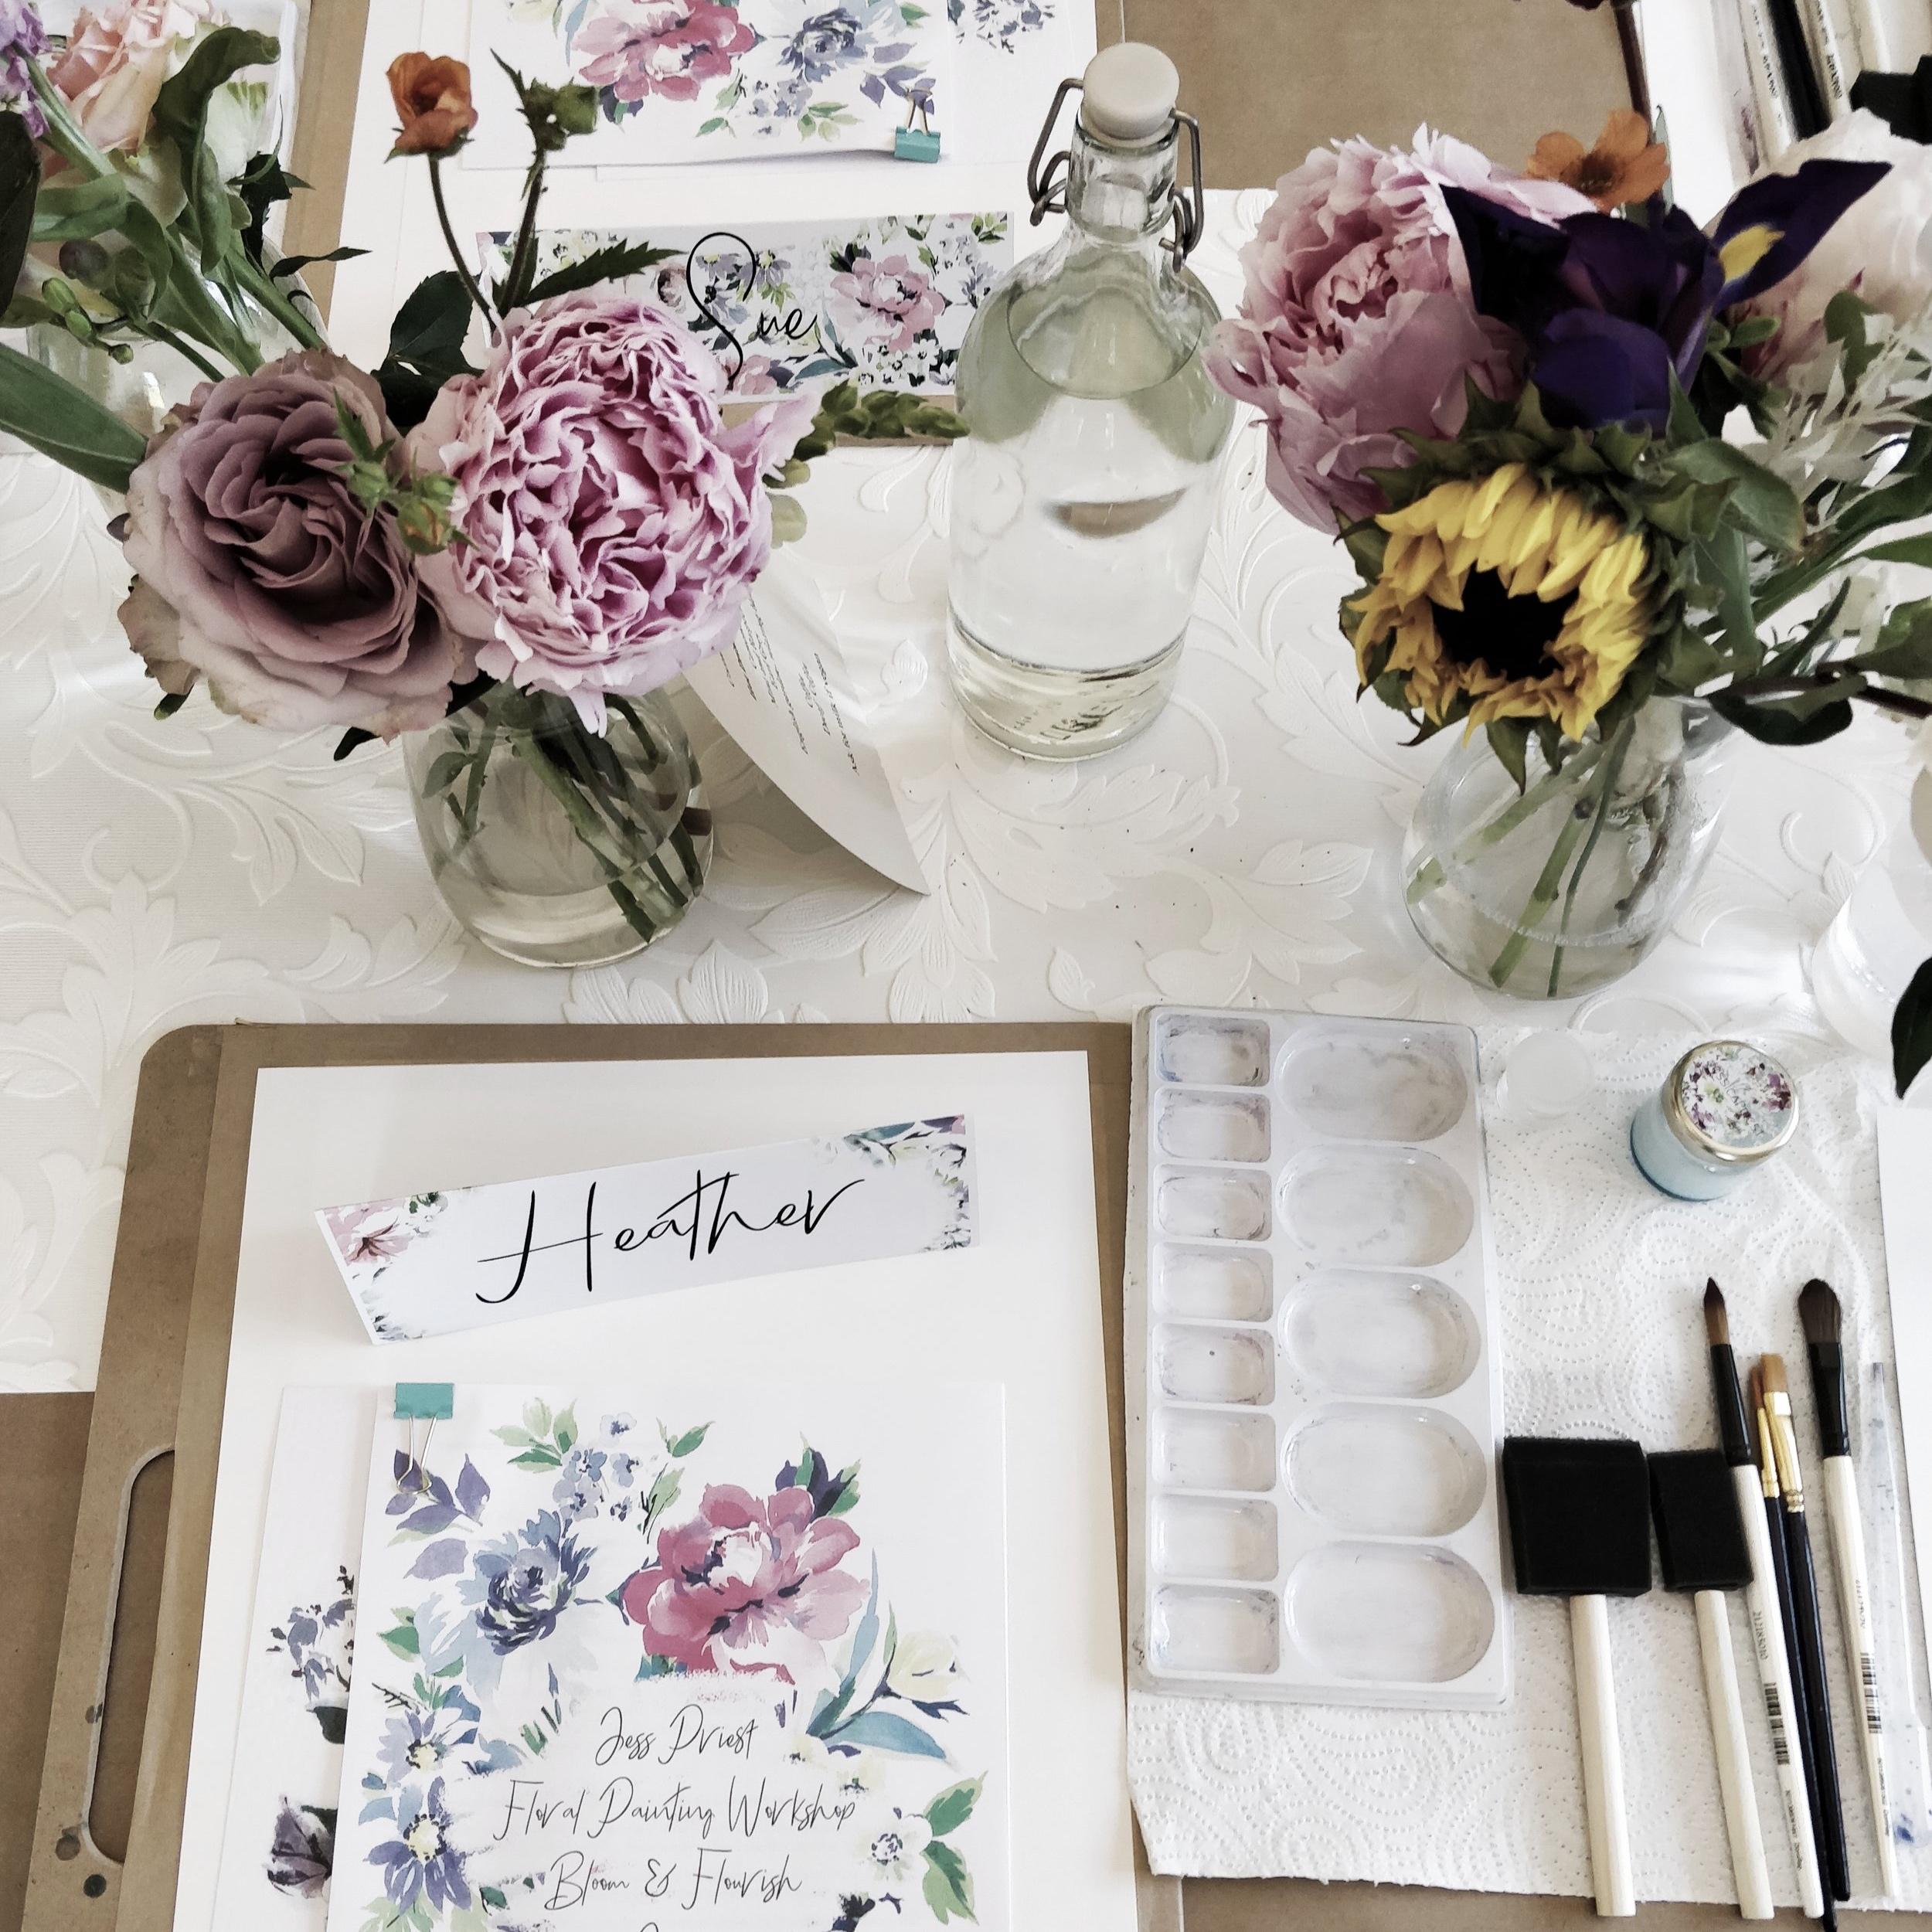 jess+watercolour+floral+workshop.jpg